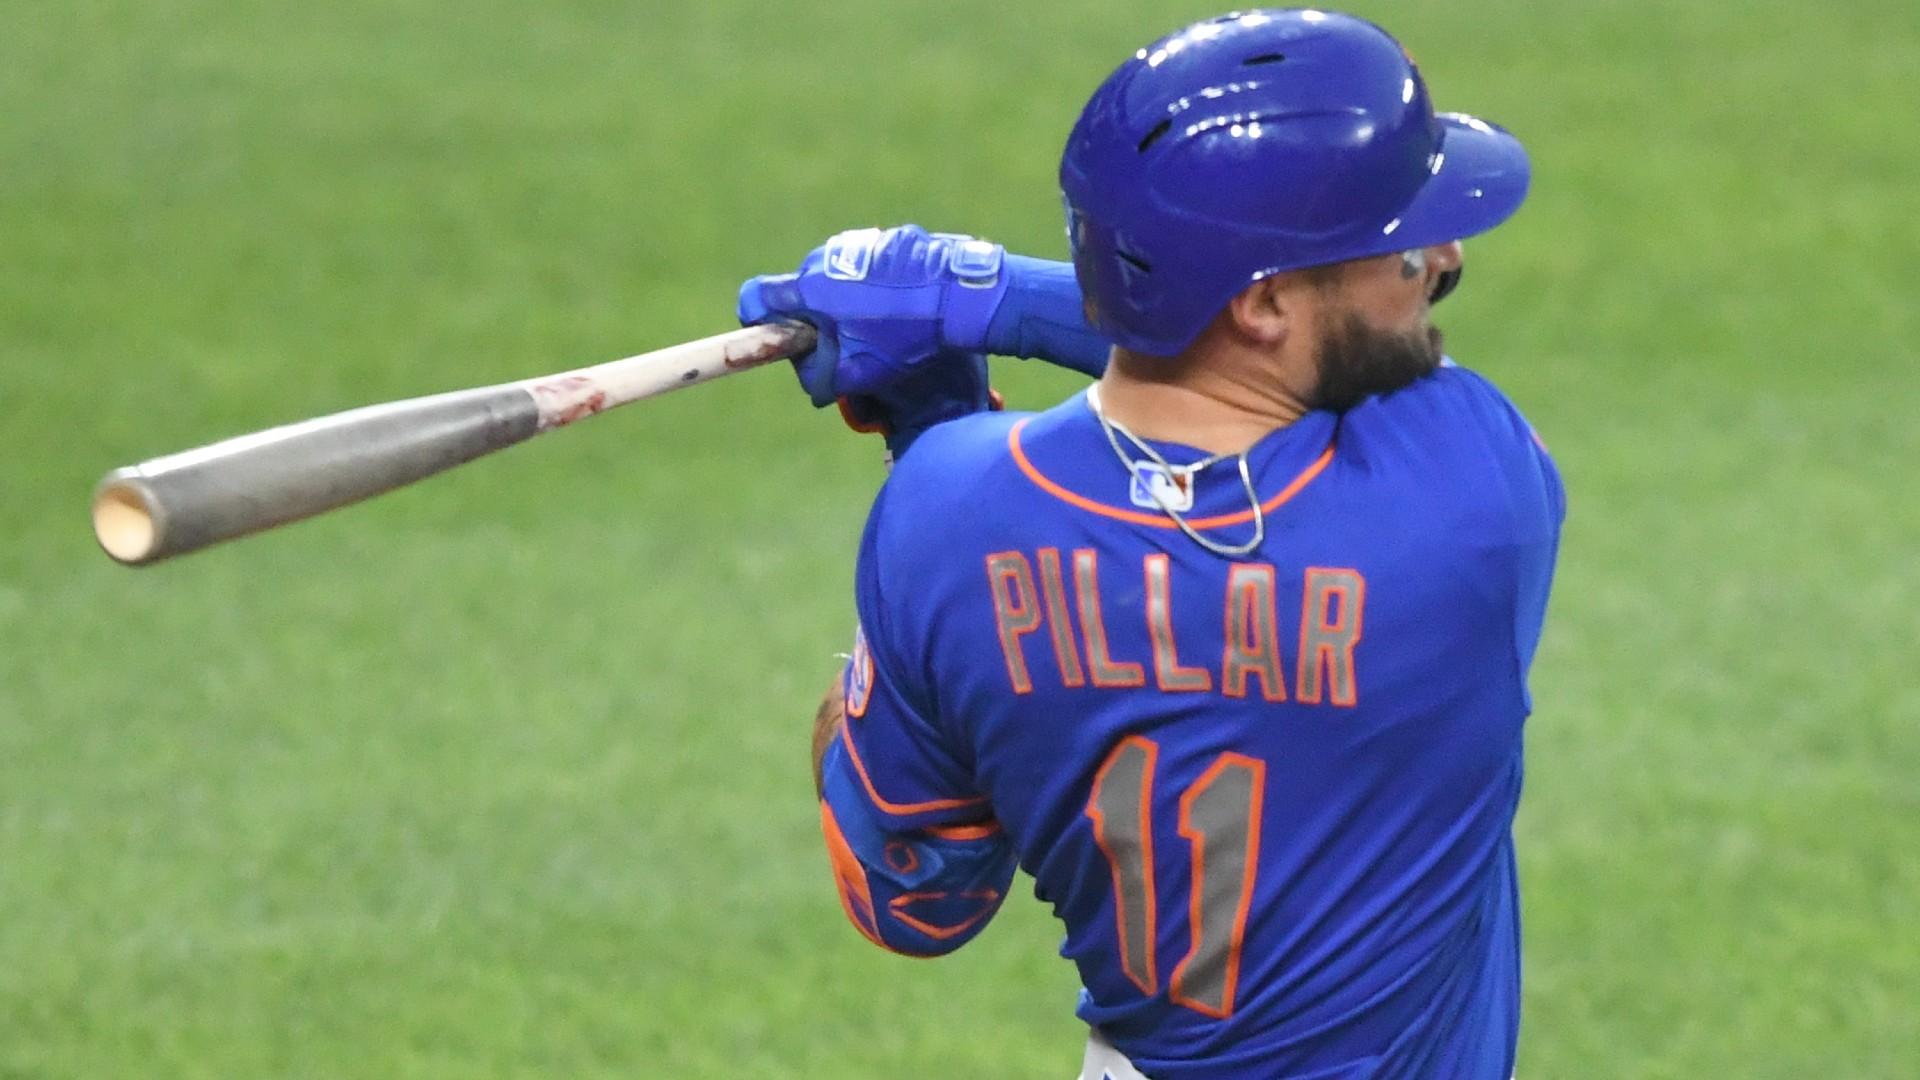 Mets' Kevin Pillar confirms his bat isn't splattered with blood, 'just pine tar stick'